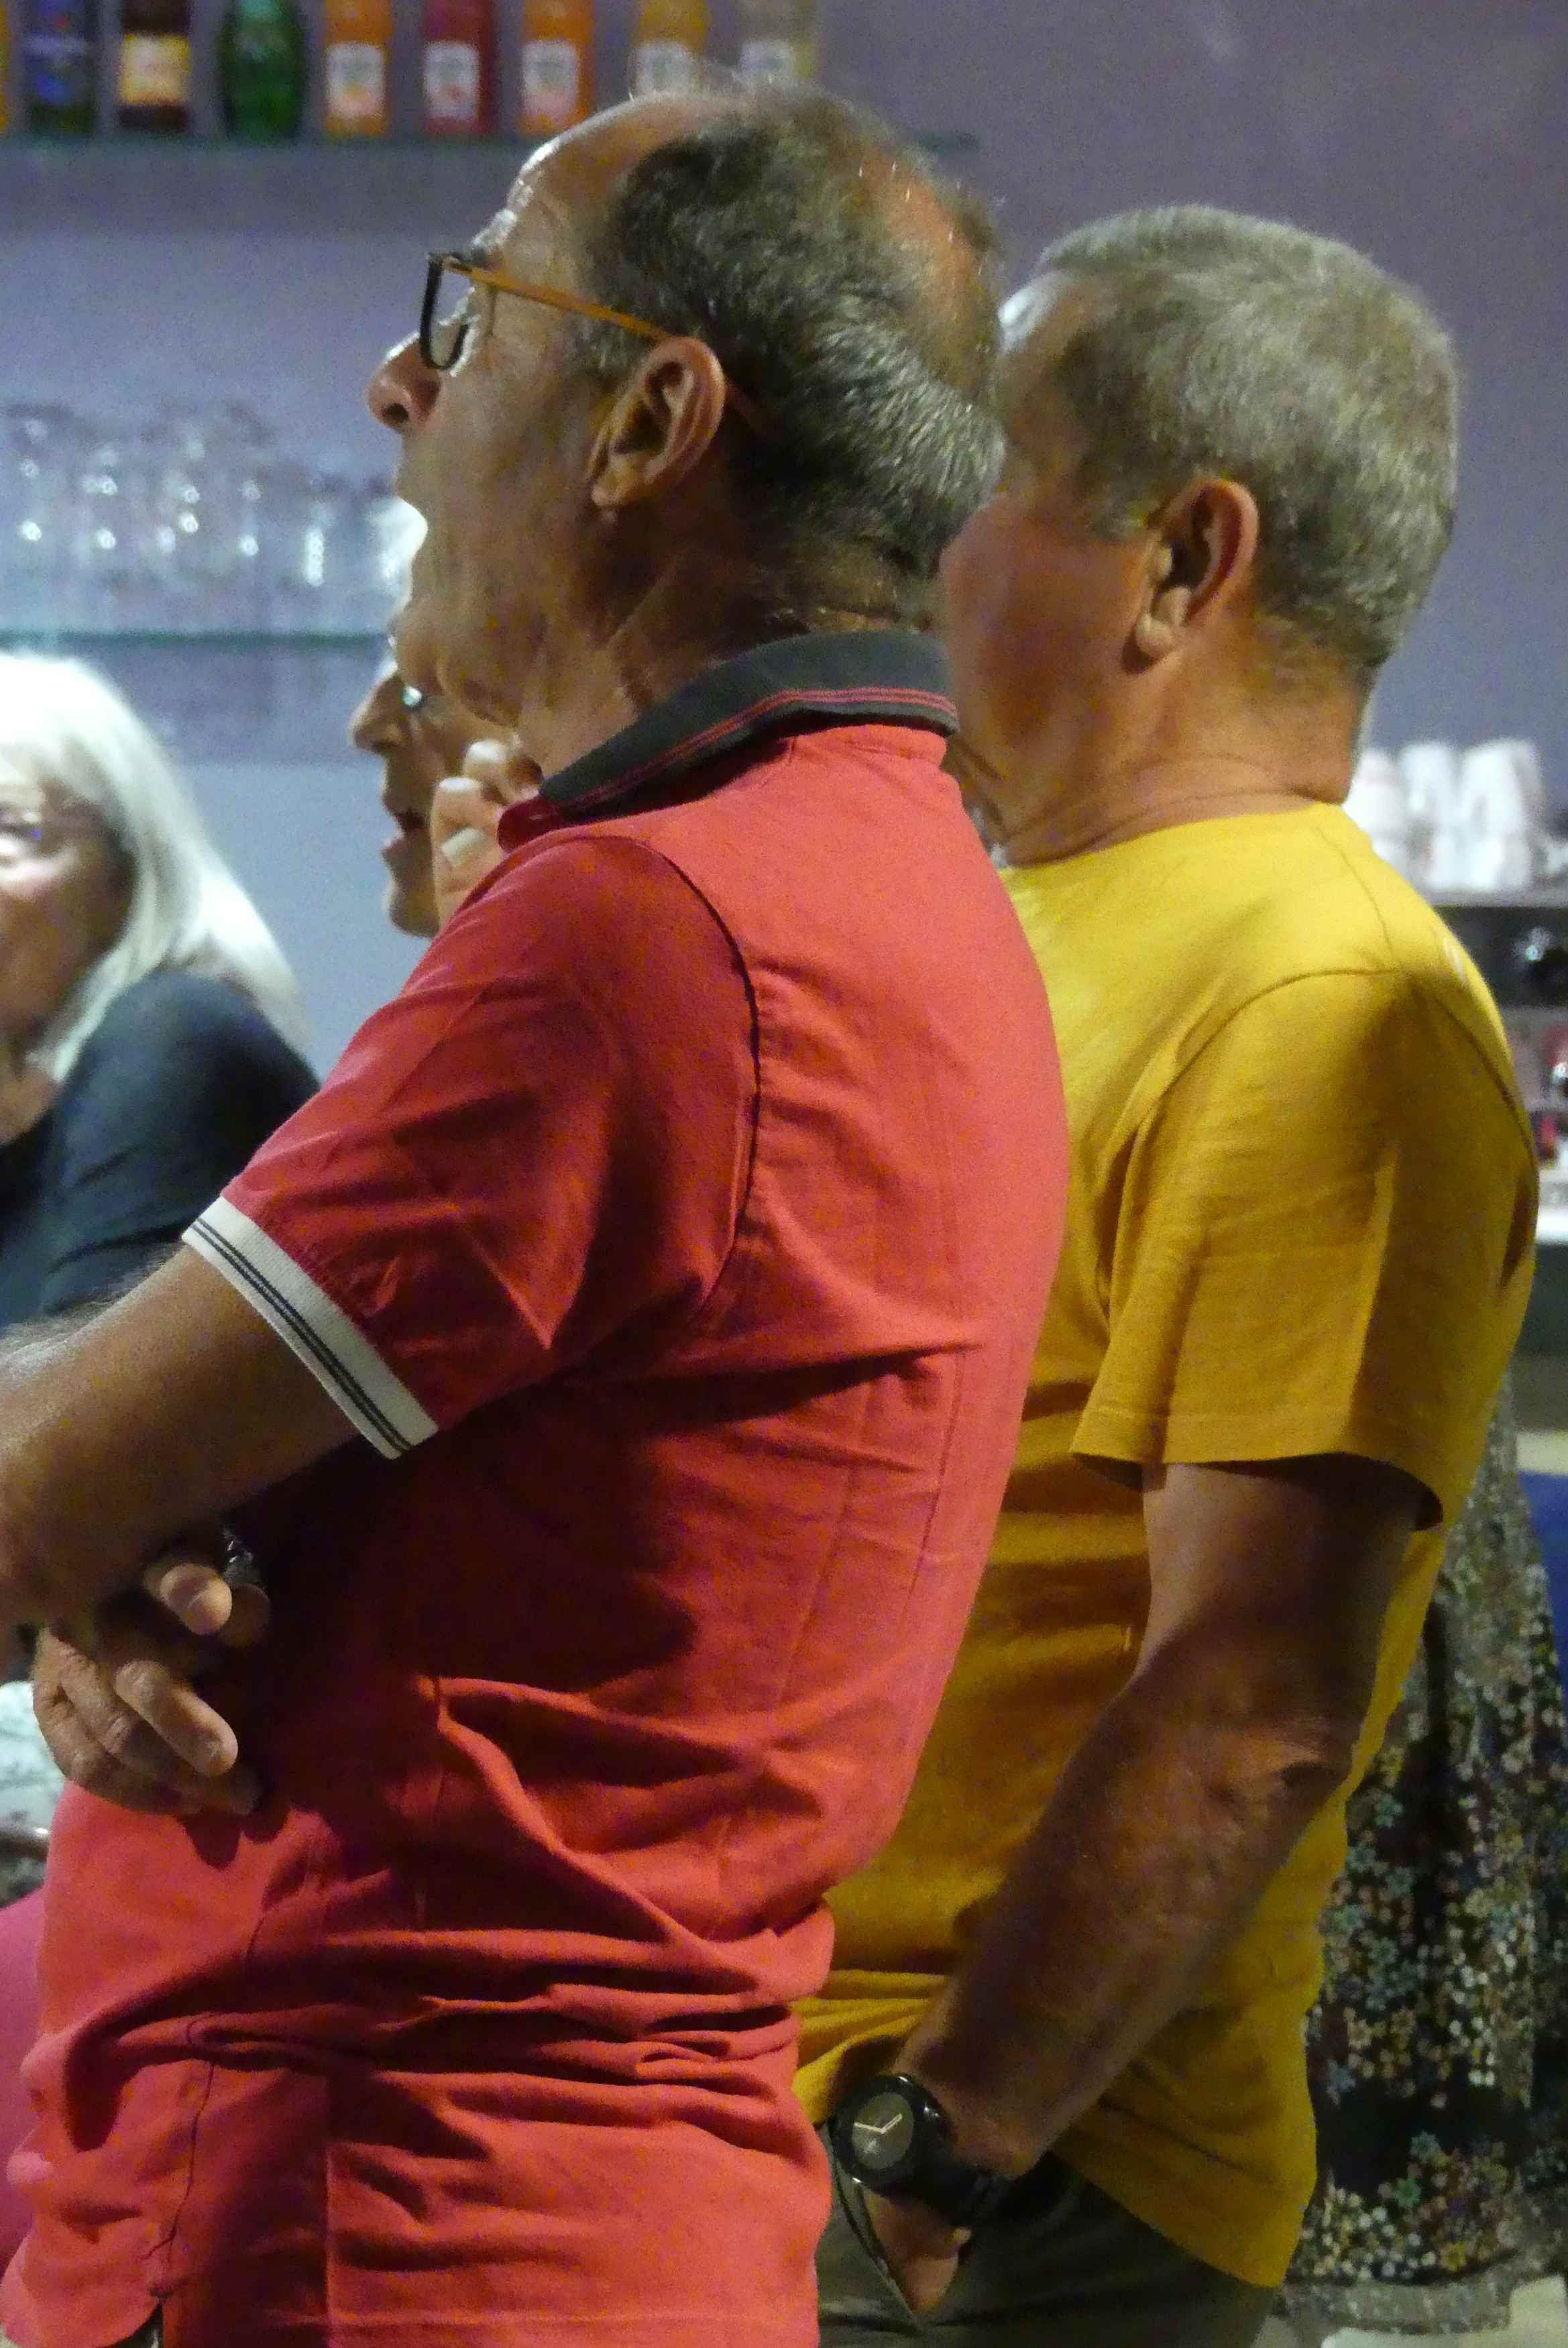 2020 09 13 0665 m soiree karaoke les tourelles normandie